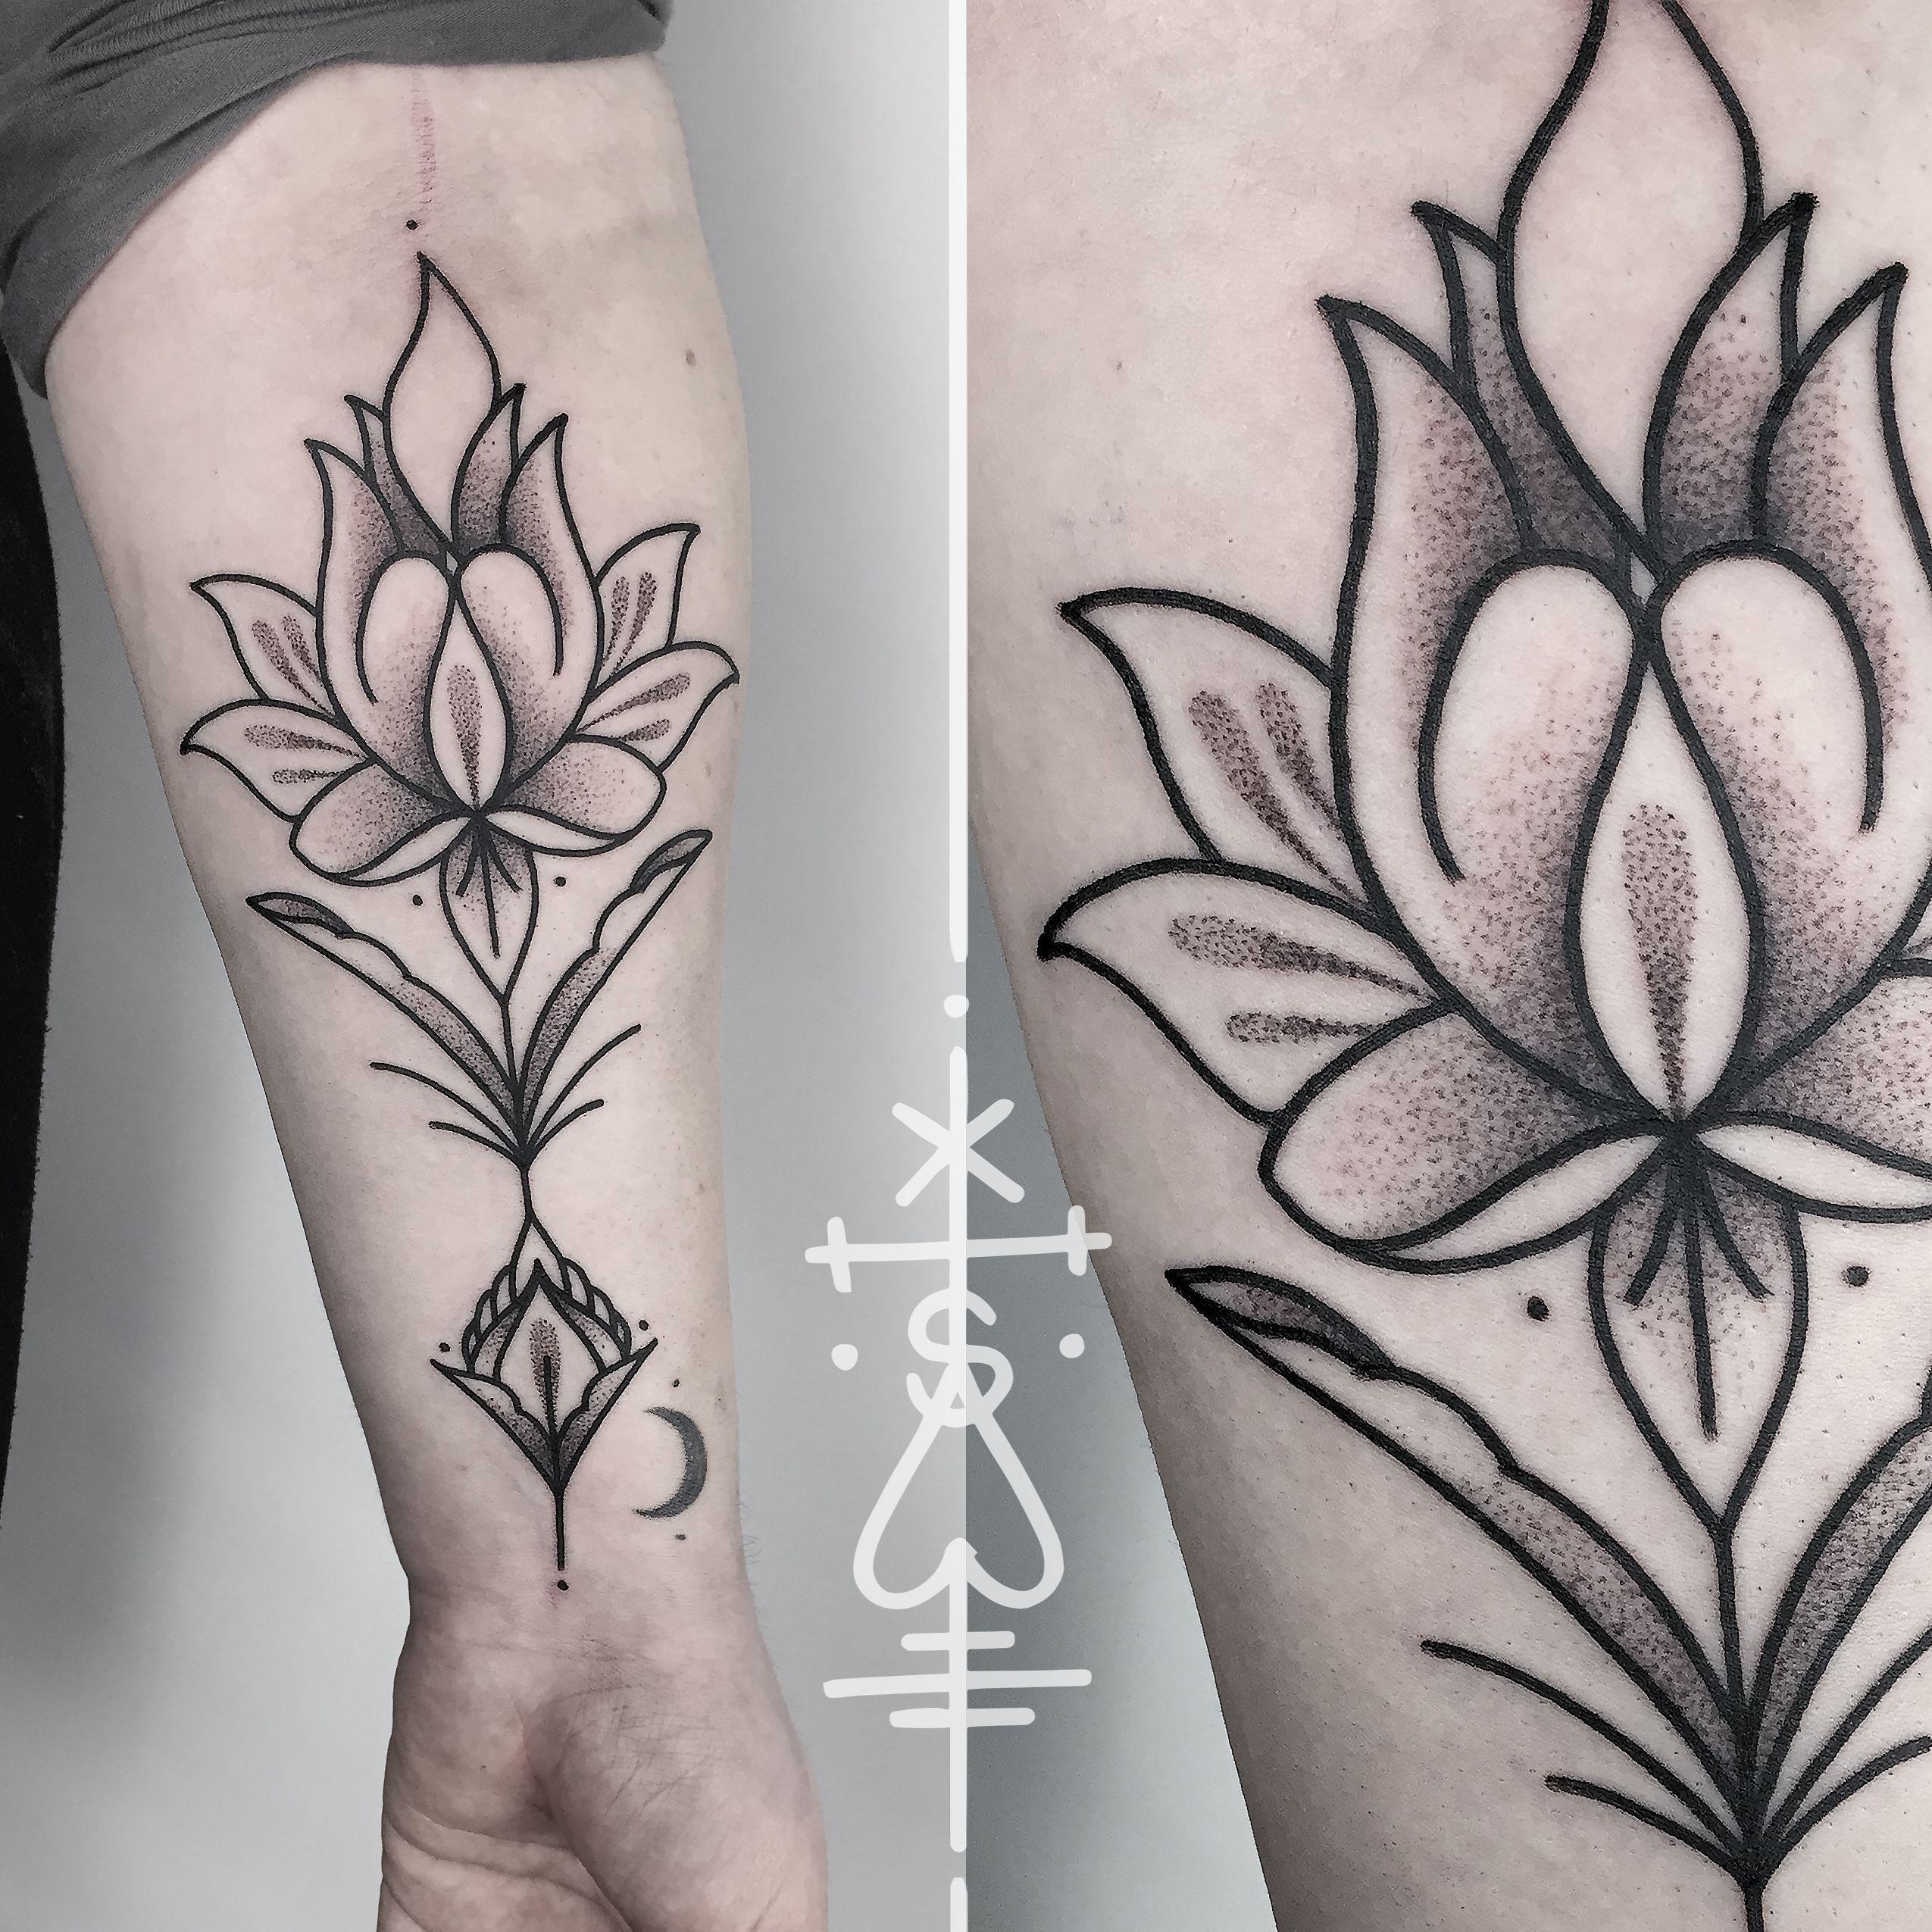 Anna S Lotus Flower From Last Week Thank You Lotus Mandala Lines Blackworkers Blackwork Dotwork Tattoo Tattoos For Women Inspirational Tattoos Tattoos